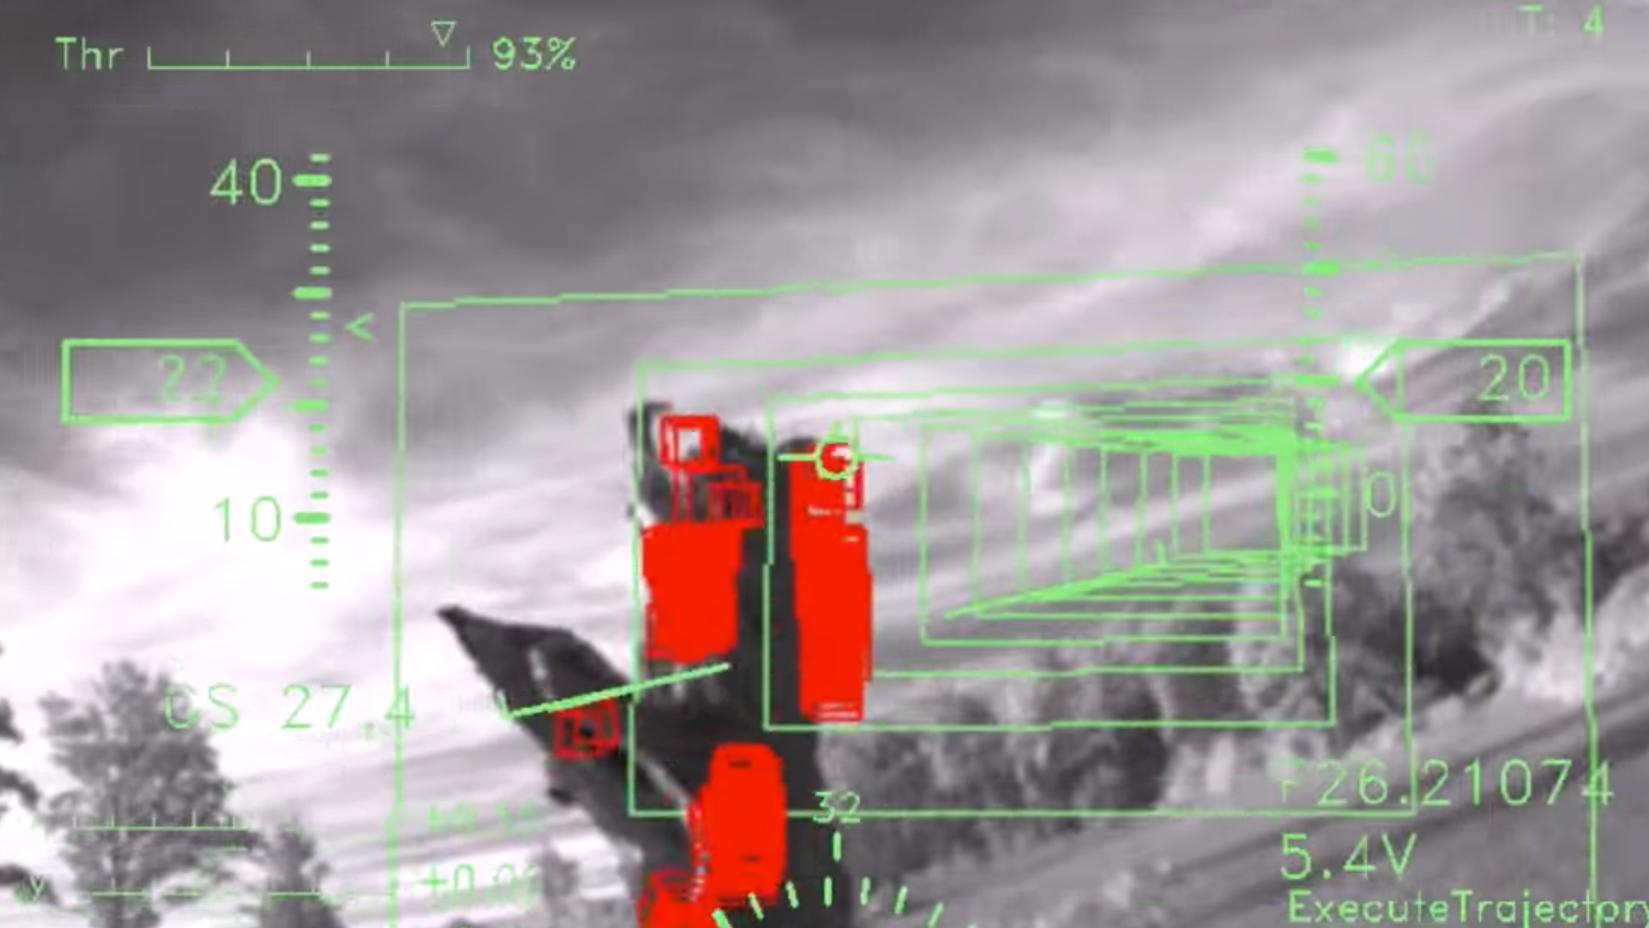 Dette er hva den autonome dronen ser. Rødt indikerer hindring. Foto: MIT/YouTube